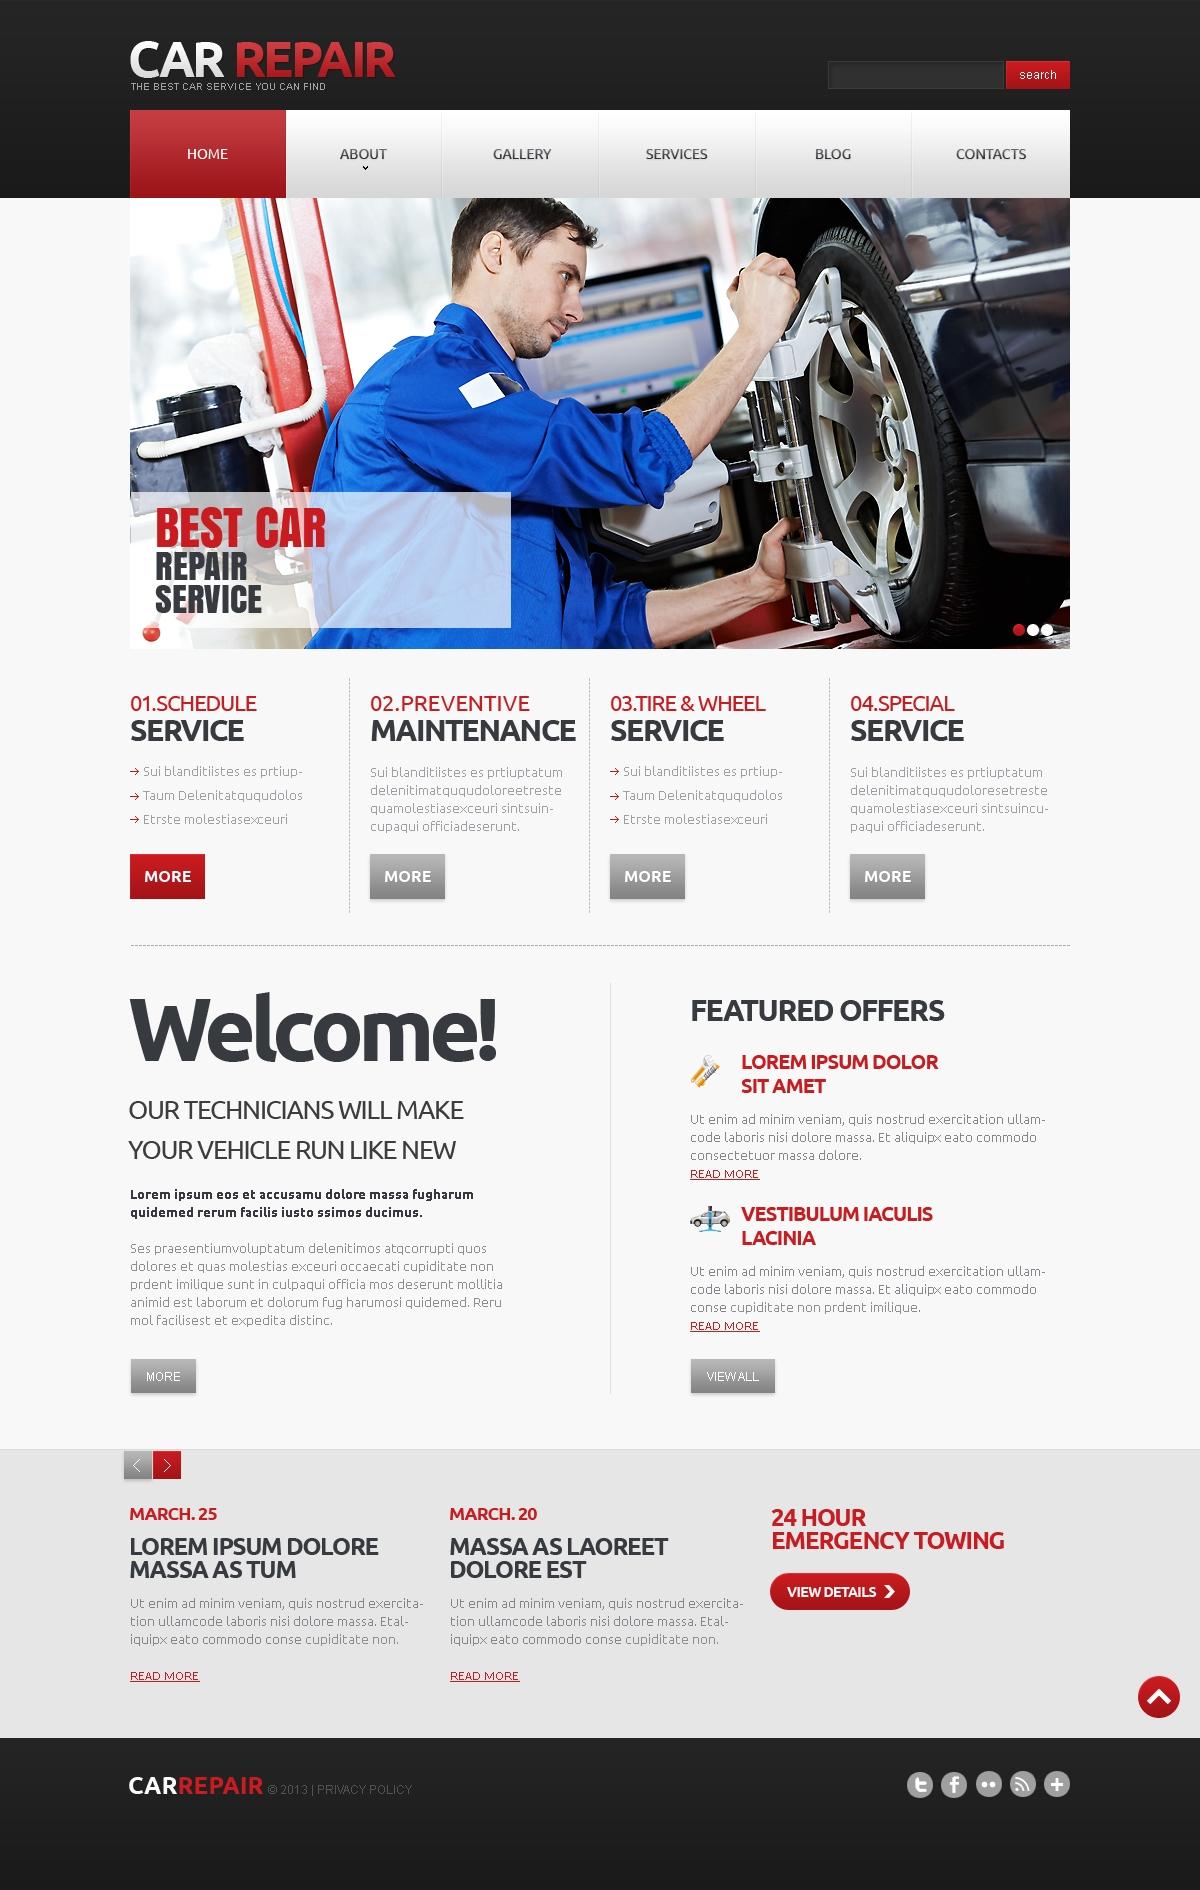 Plantilla Joomla Responsive para Sitio de Reparación de coches #47115 - captura de pantalla